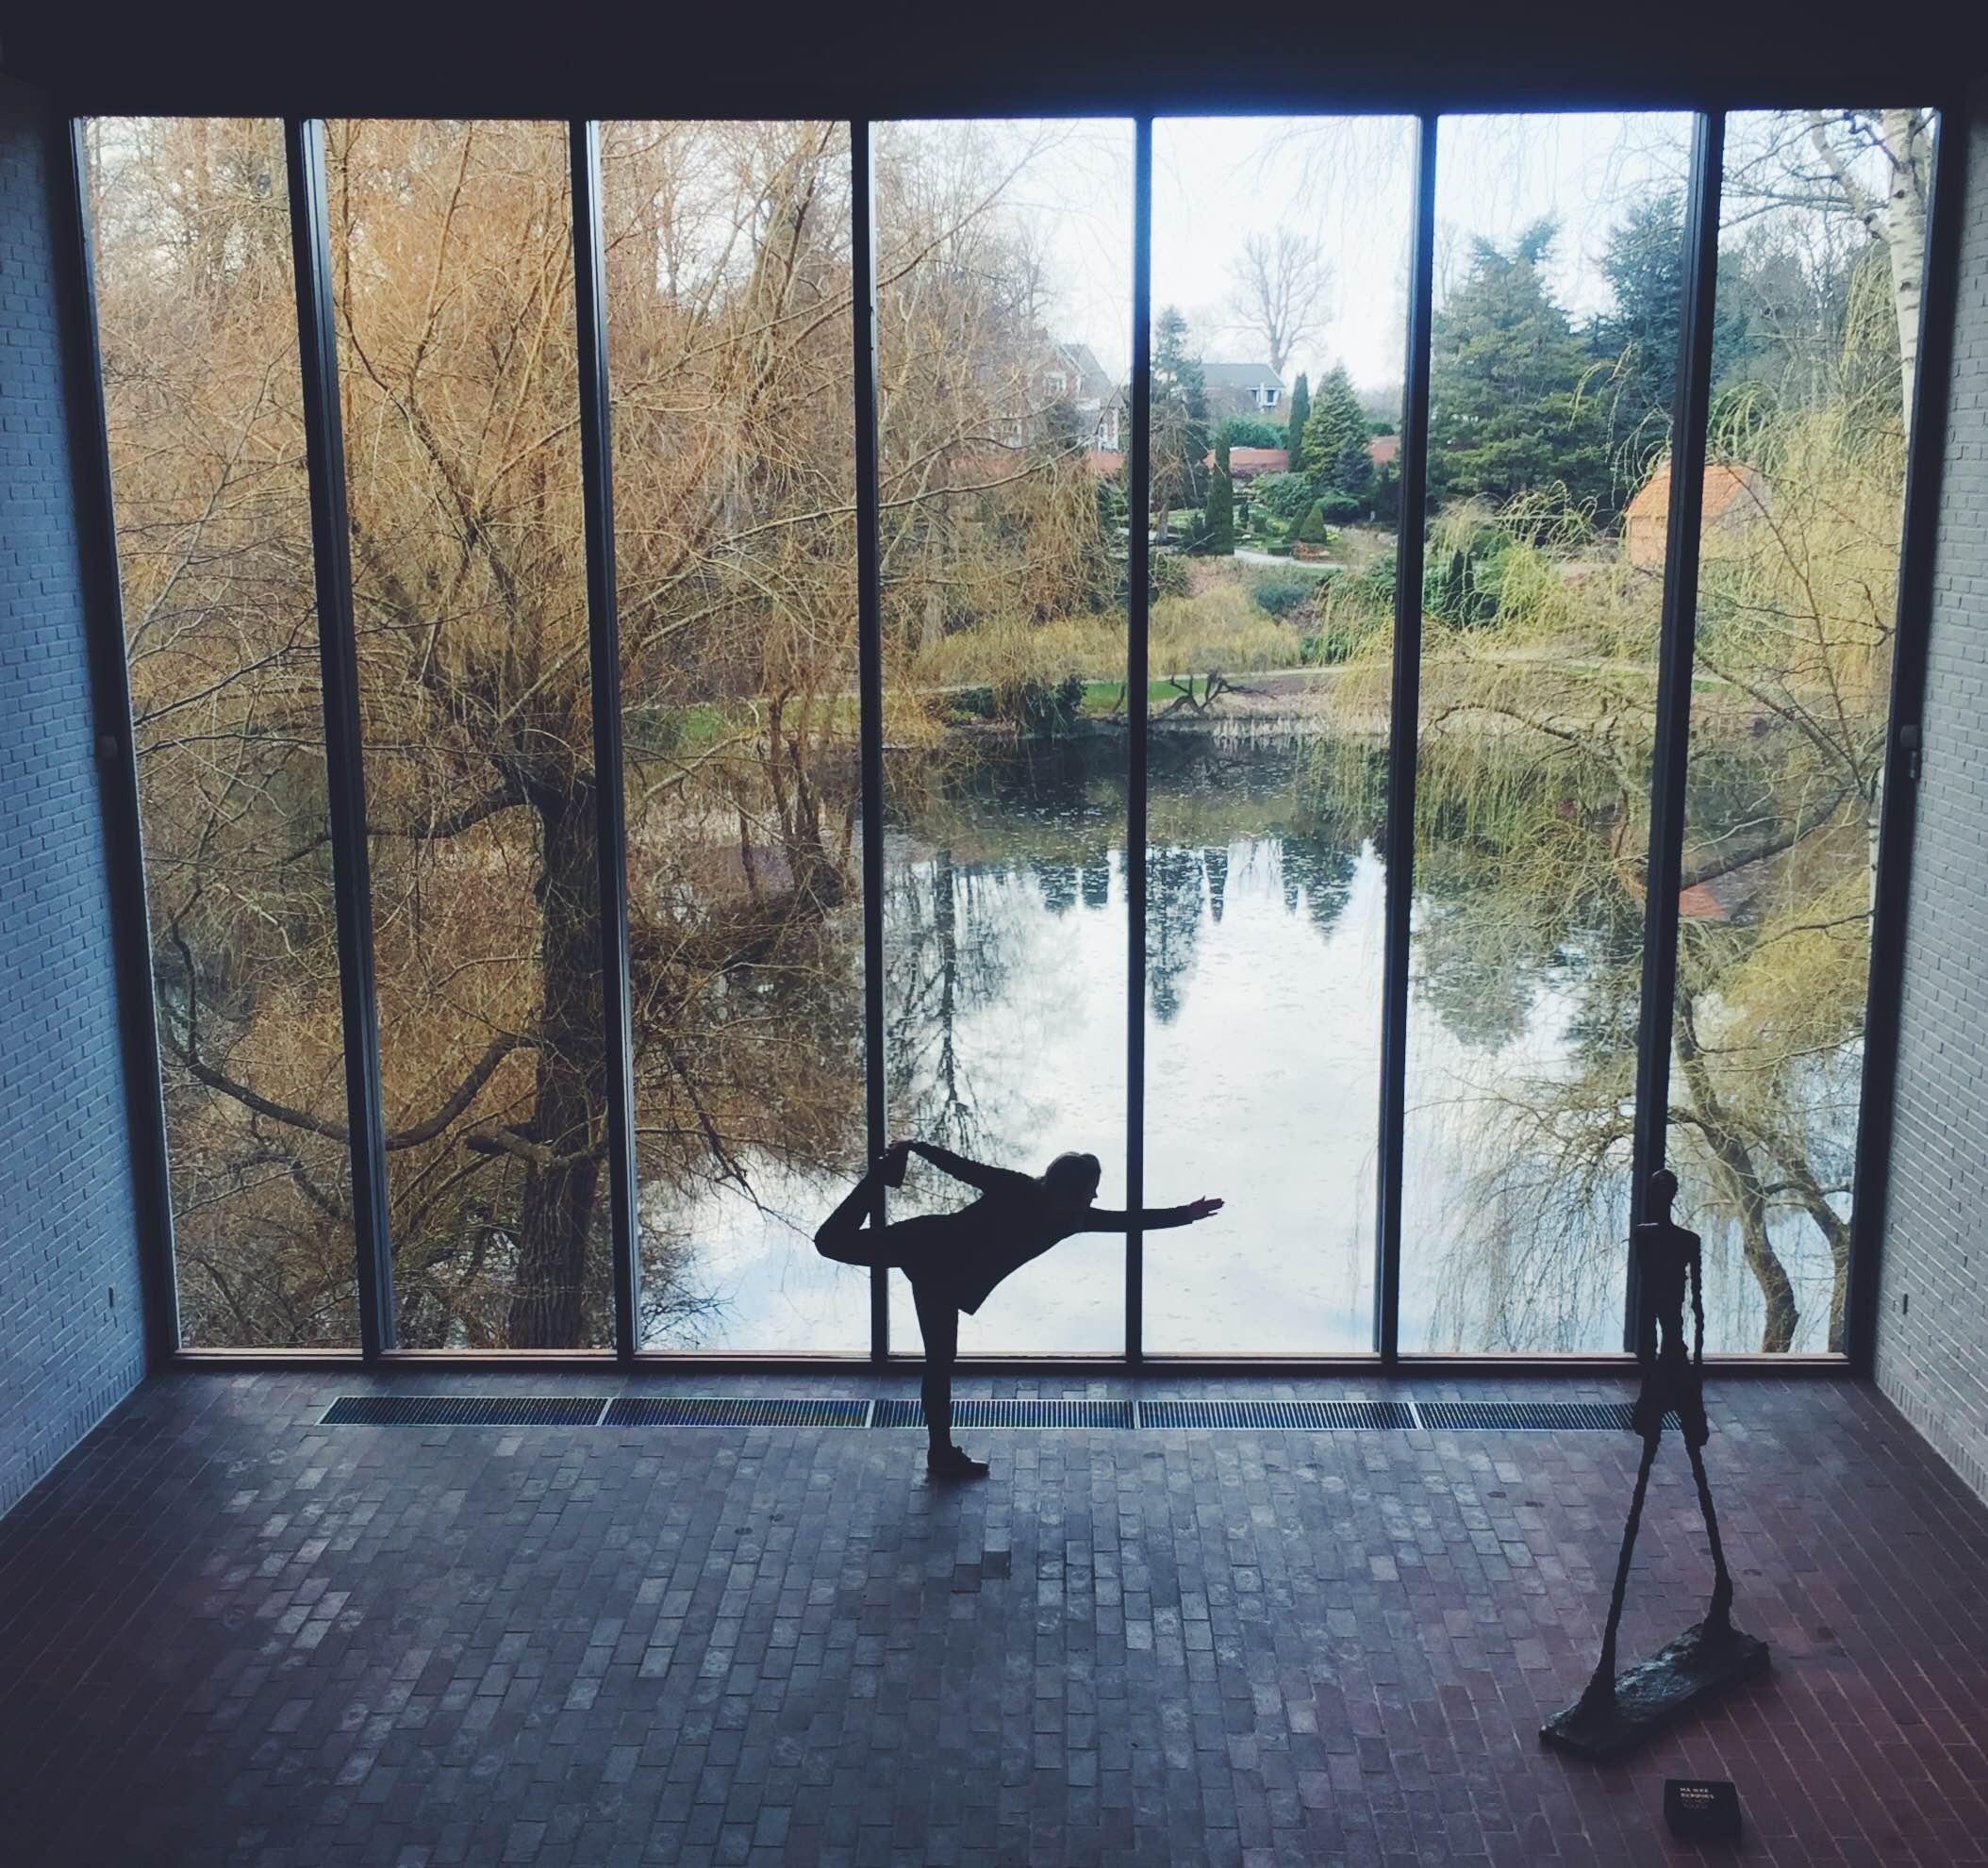 Giacometti-salen på Louisiana i Humlebæk og yoga-øvelse